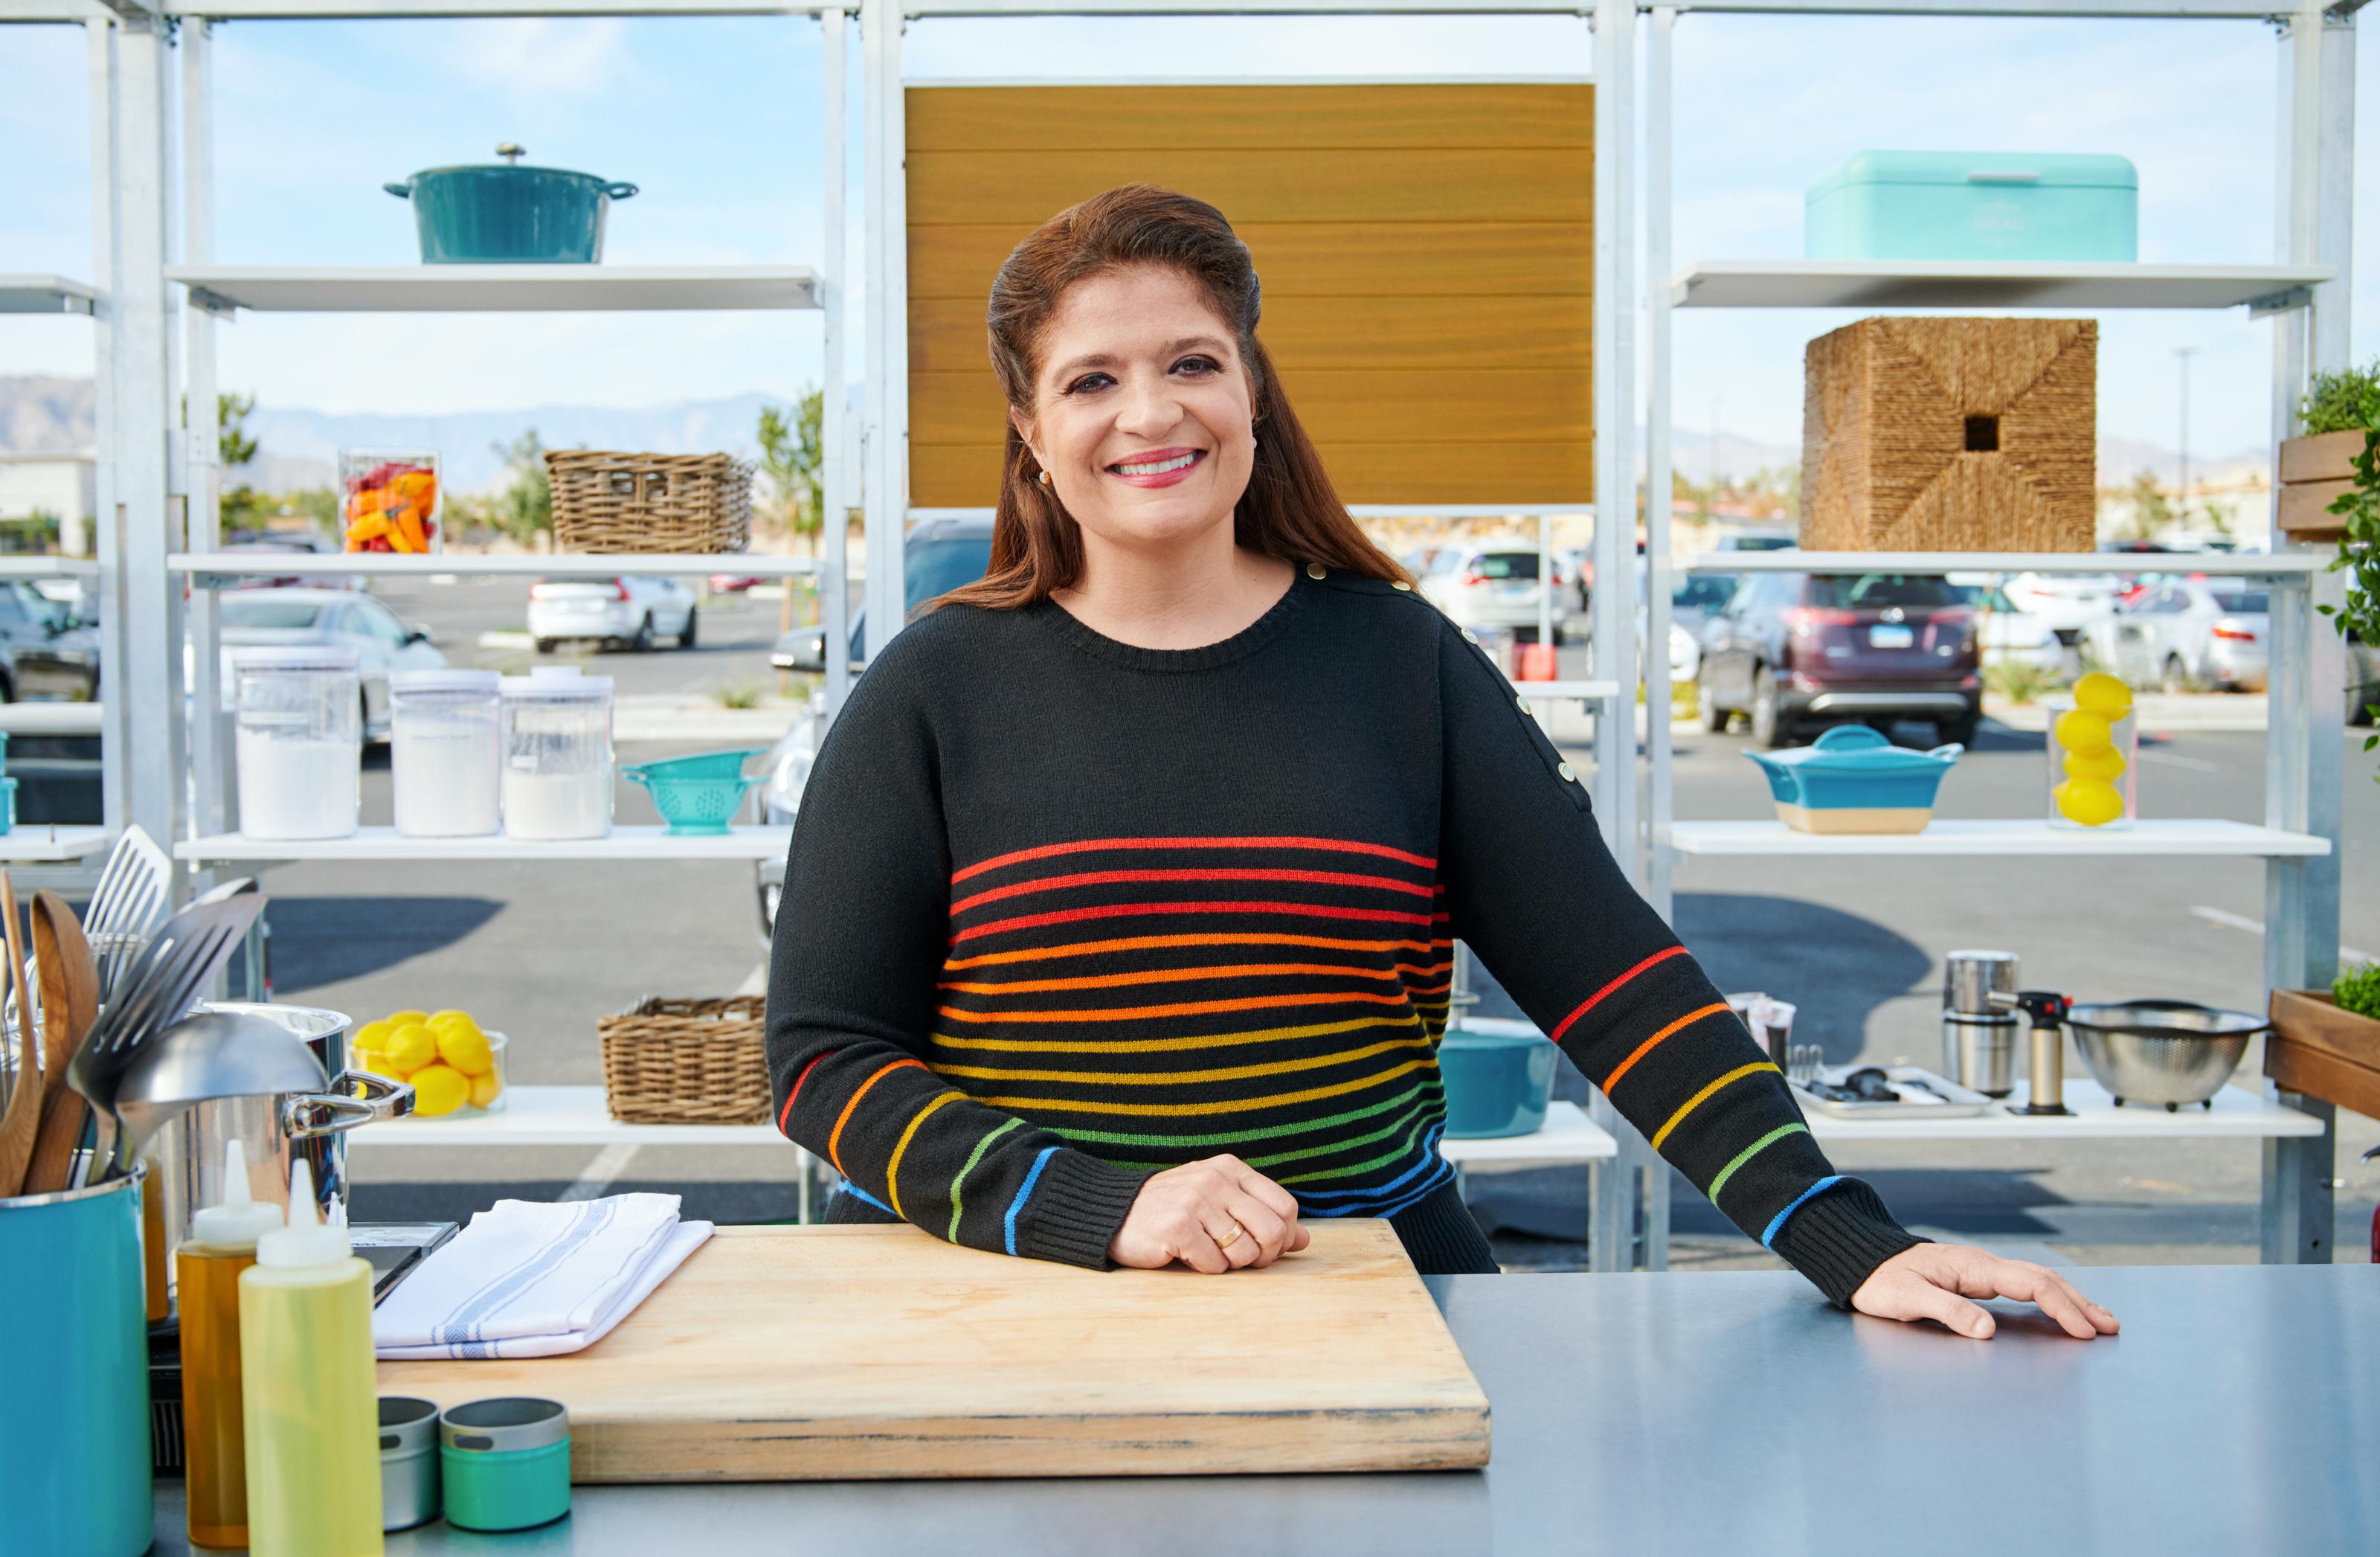 Alex Guarnaschelli Joins Anne Burrell On Worst Cooks In America